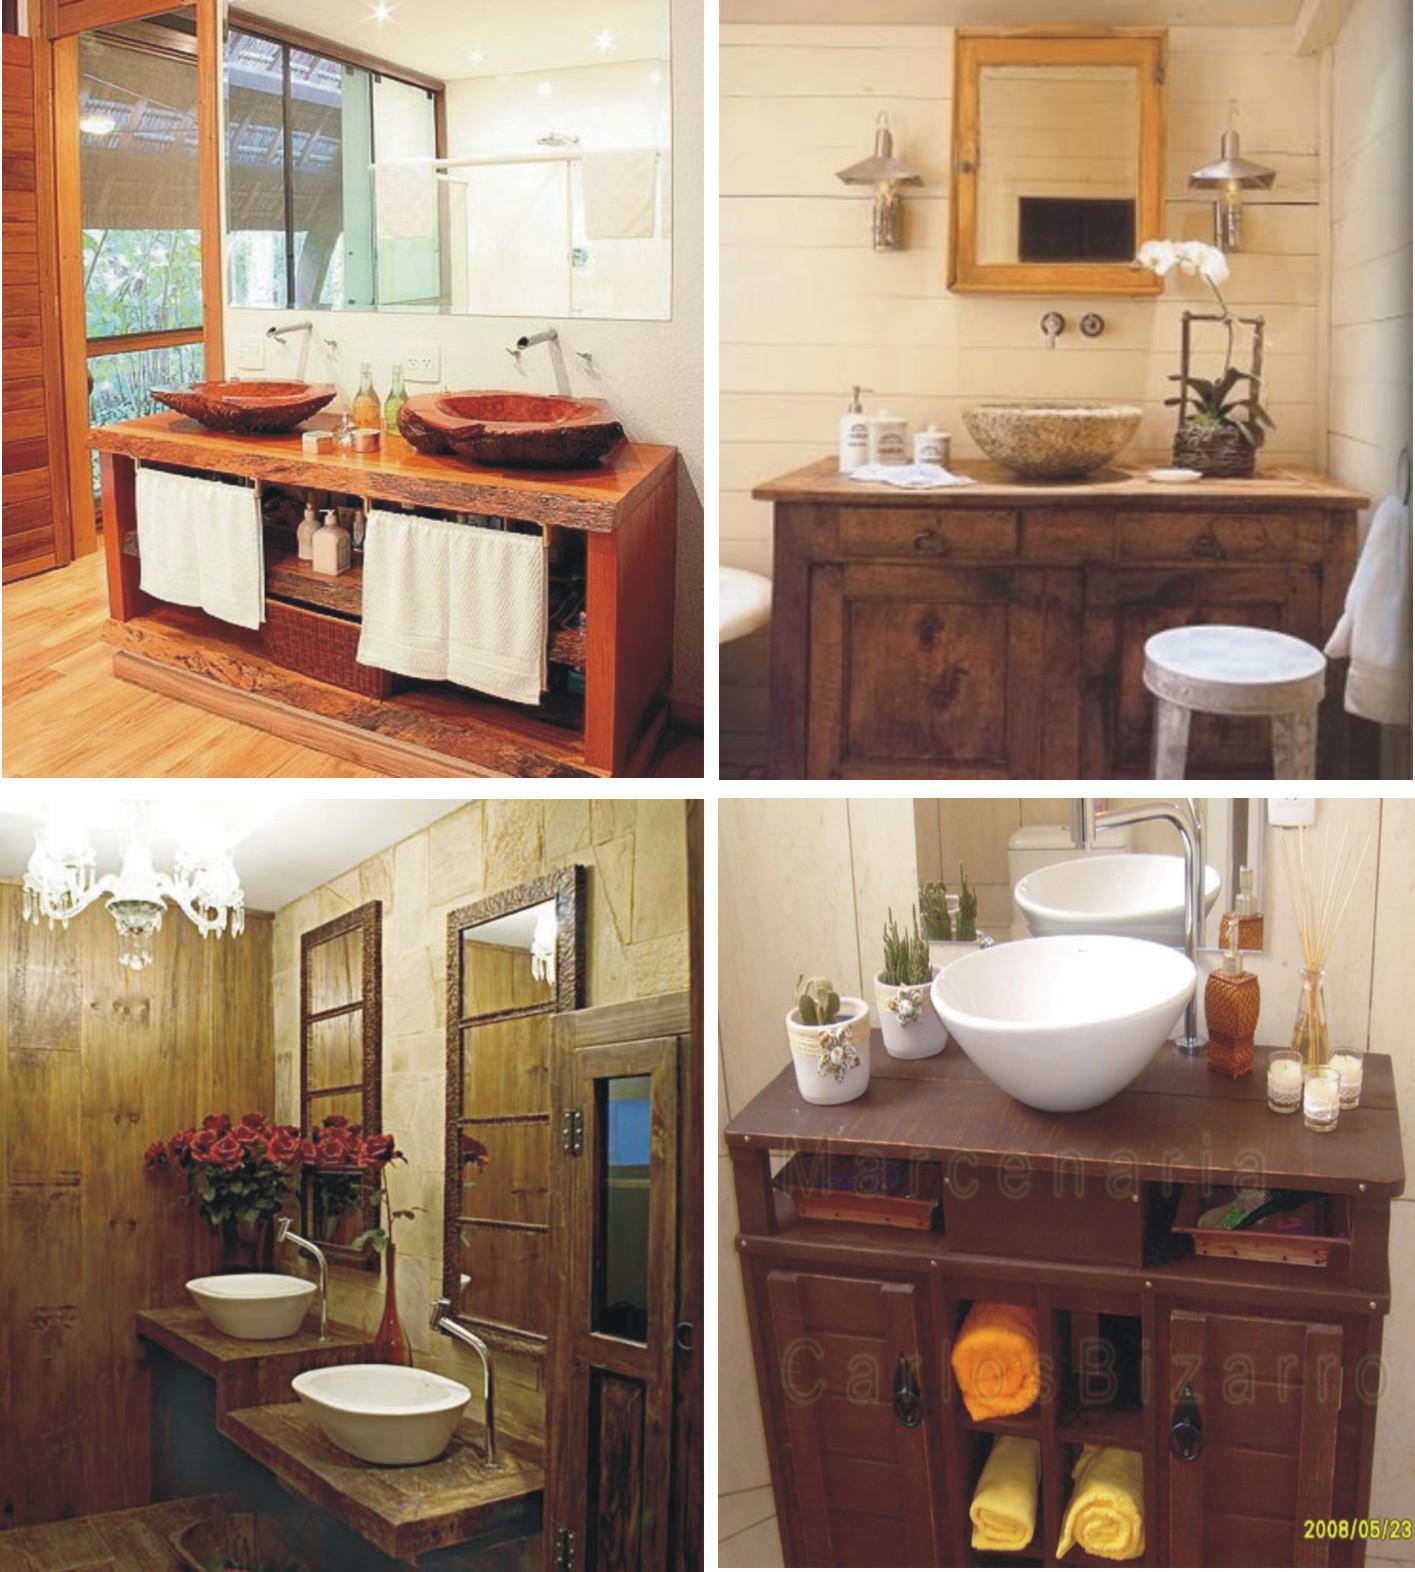 Bella Regazza Decor Banheiro Rústico -> Cuba Para Banheiro Rustica